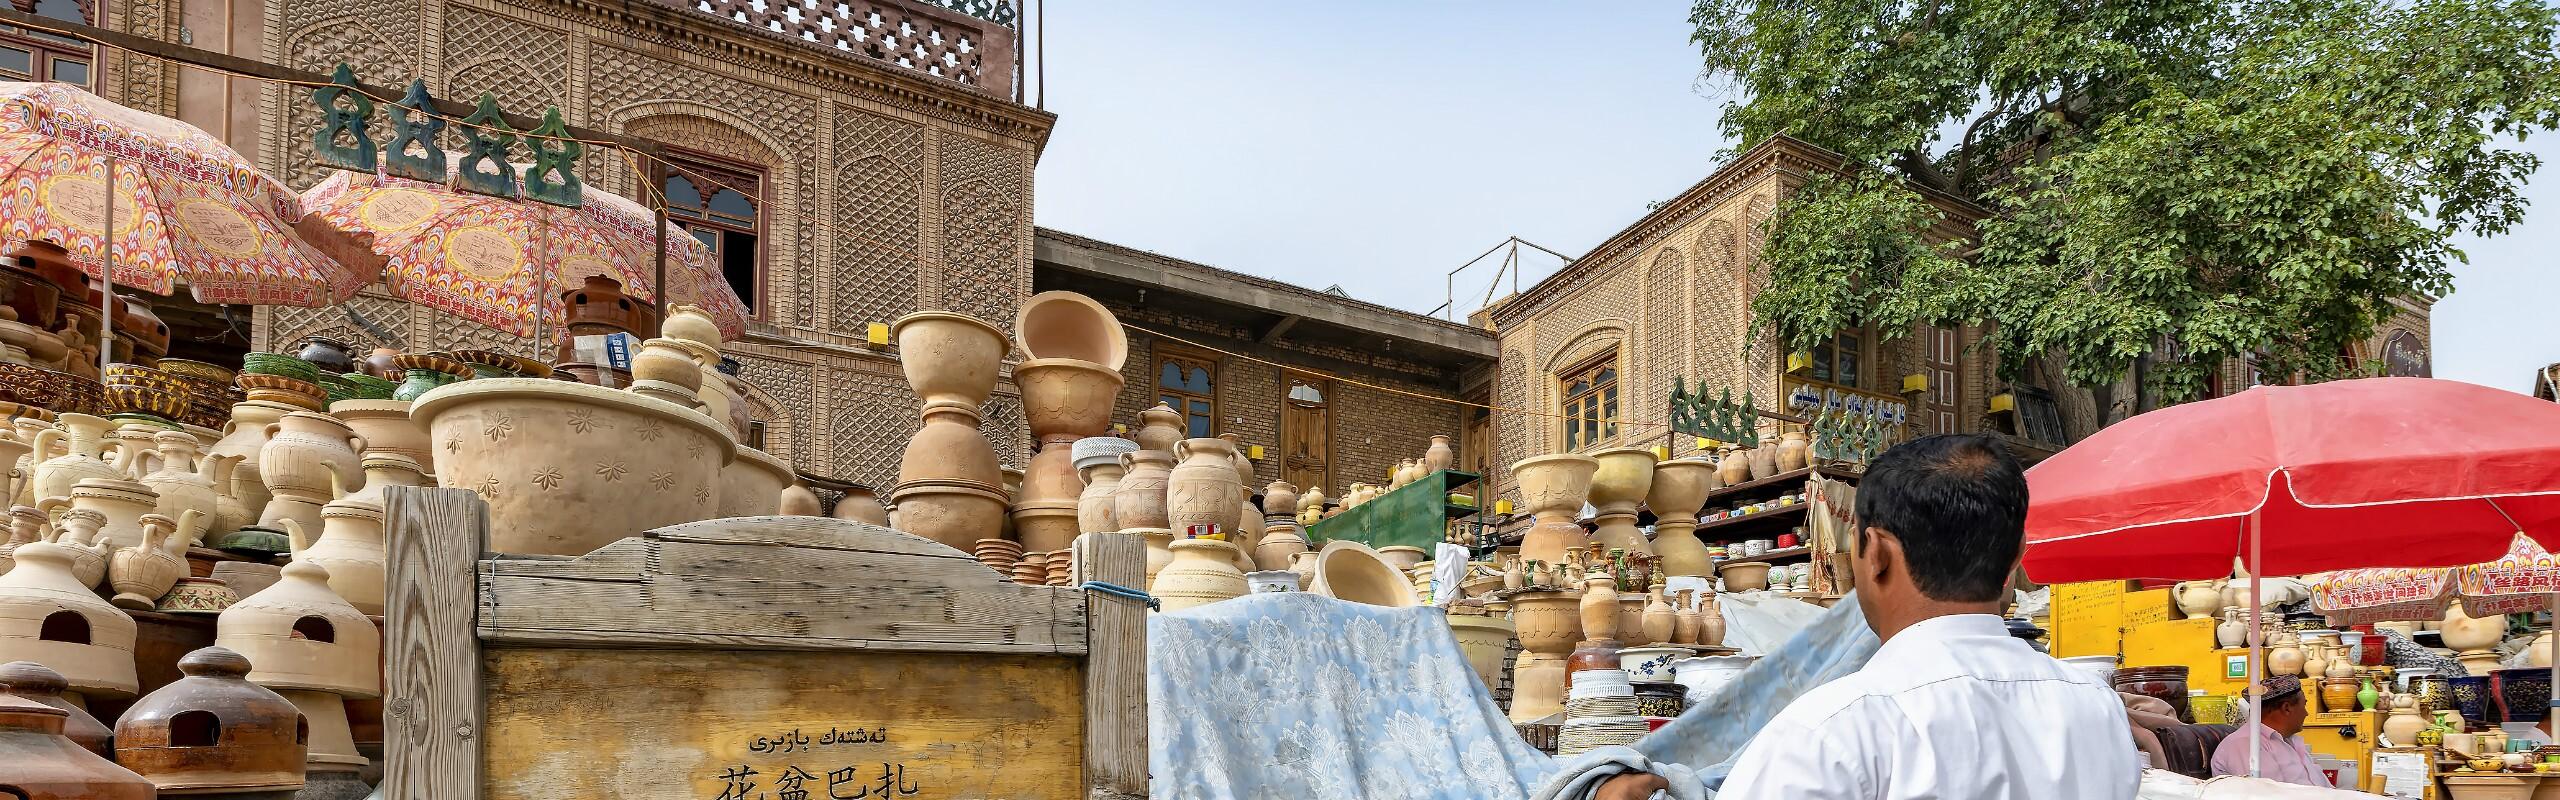 7 Days Xinjiang Silk Road Highlights Tour